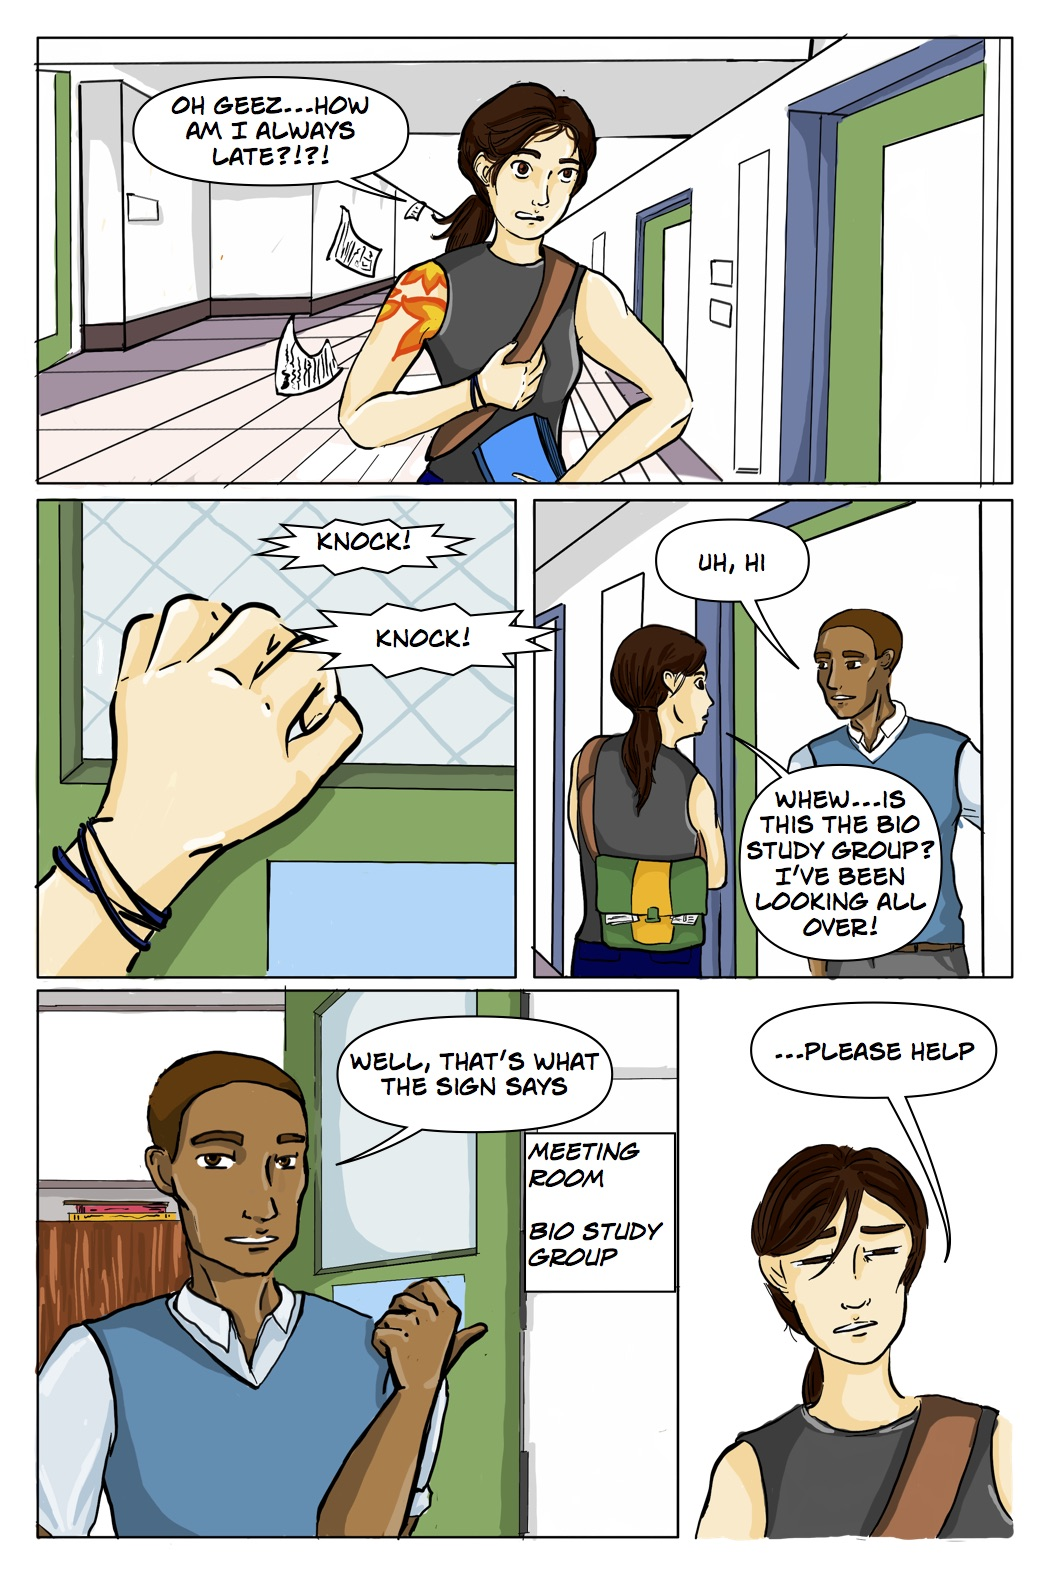 ComicCh1_Bio120.jpg